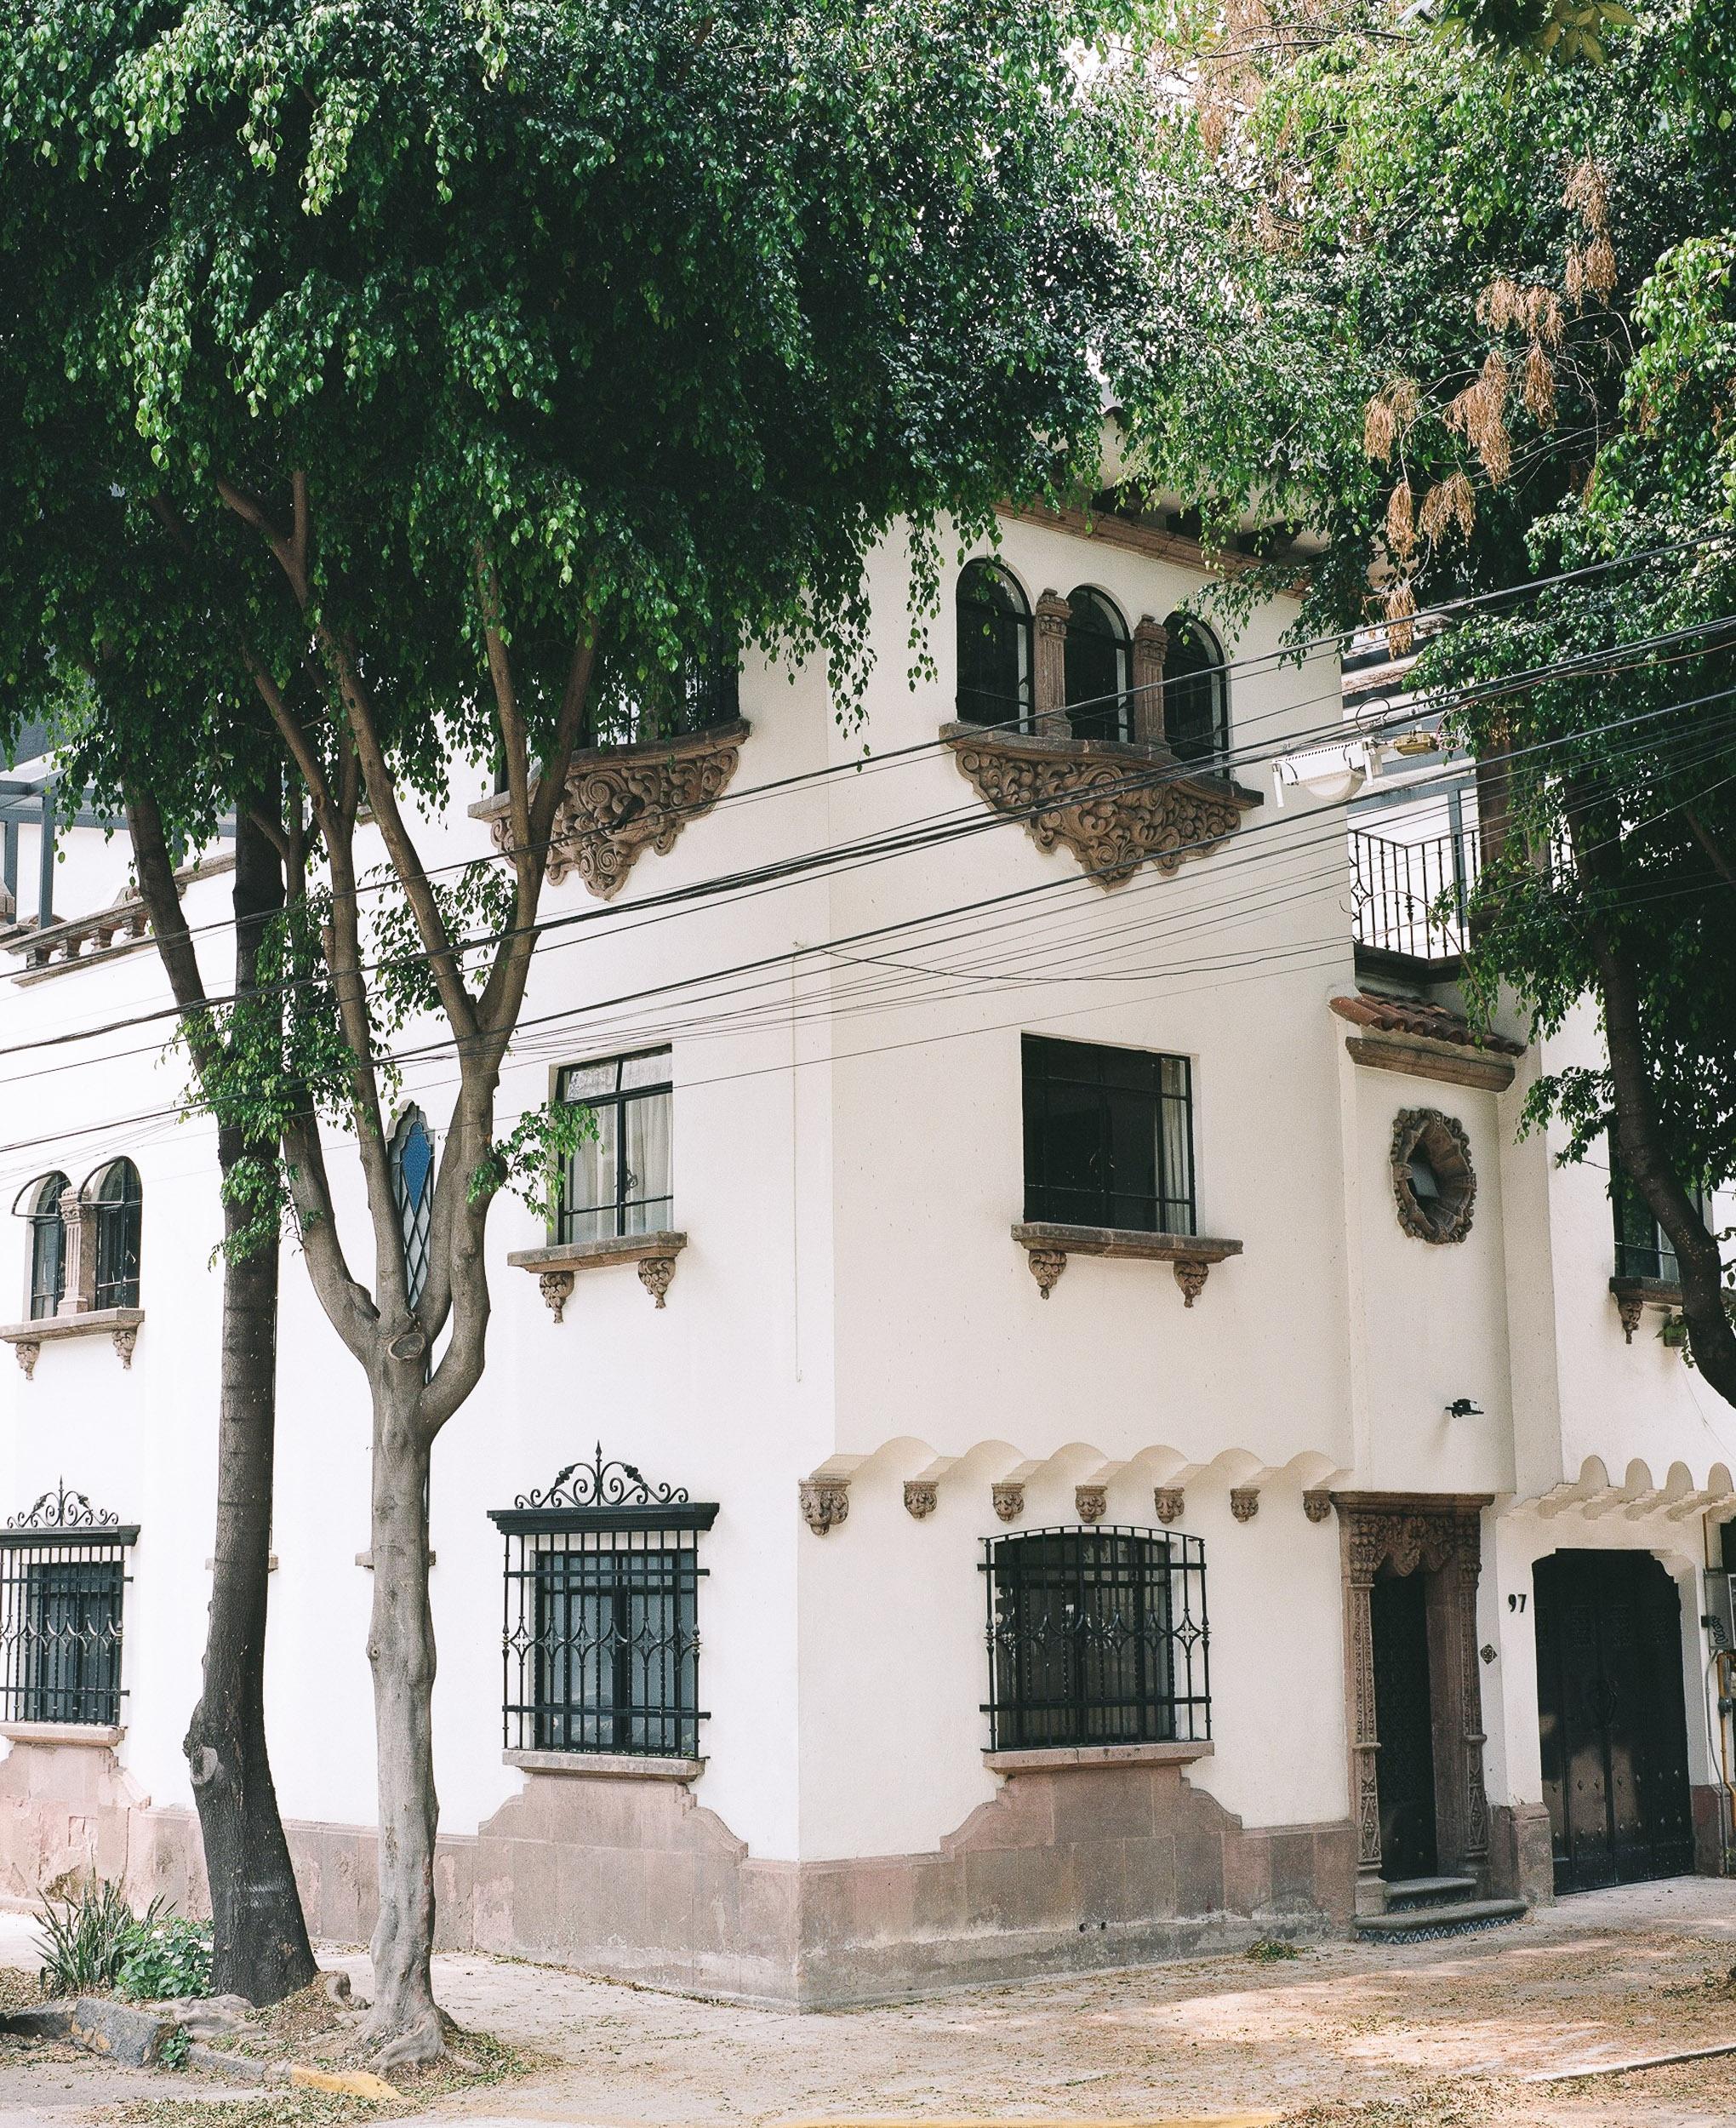 Building in Mexico City